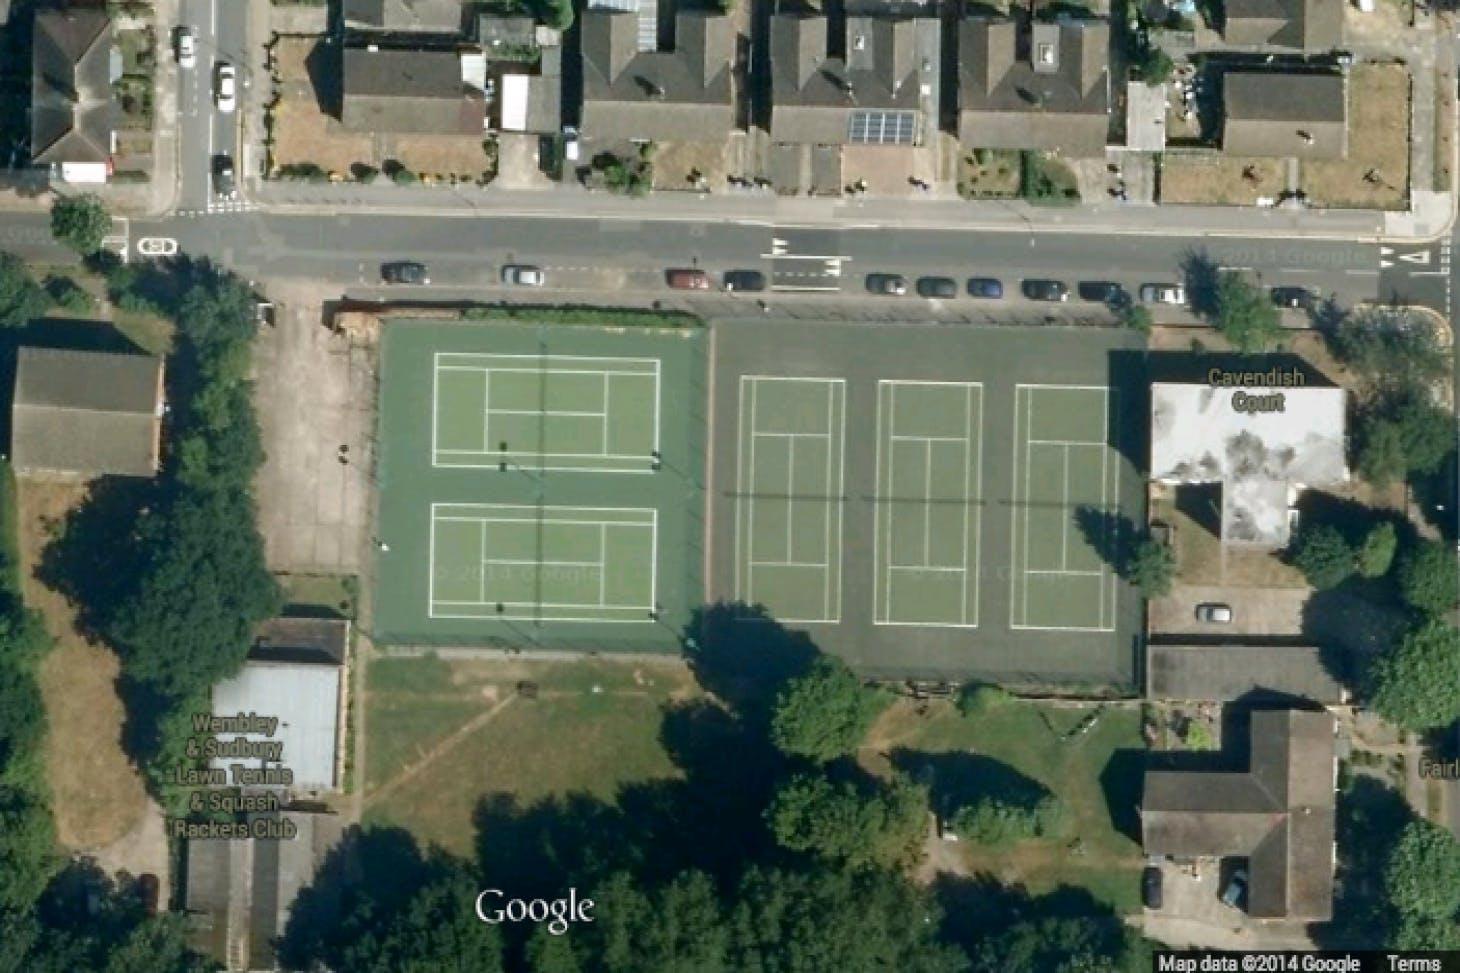 Wembley and Sudbury Lawn Tennis & Squash Club Outdoor | Hard (macadam) tennis court